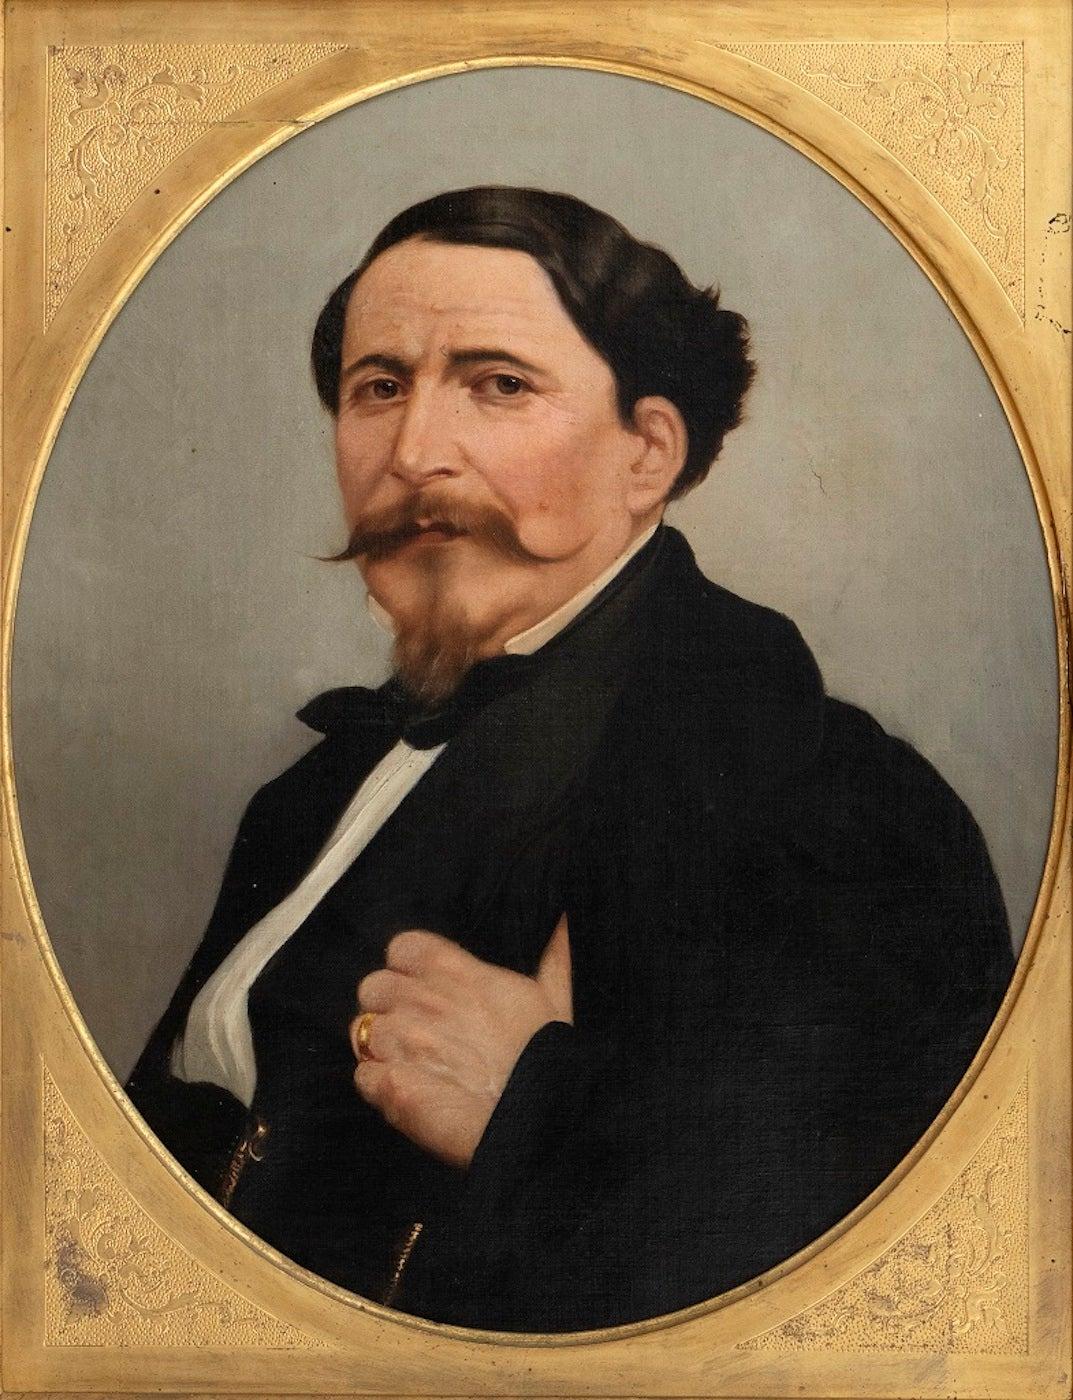 Portrait of a Man - Original Oil on Canvas by M. Gordigiani - Mid 19th Century